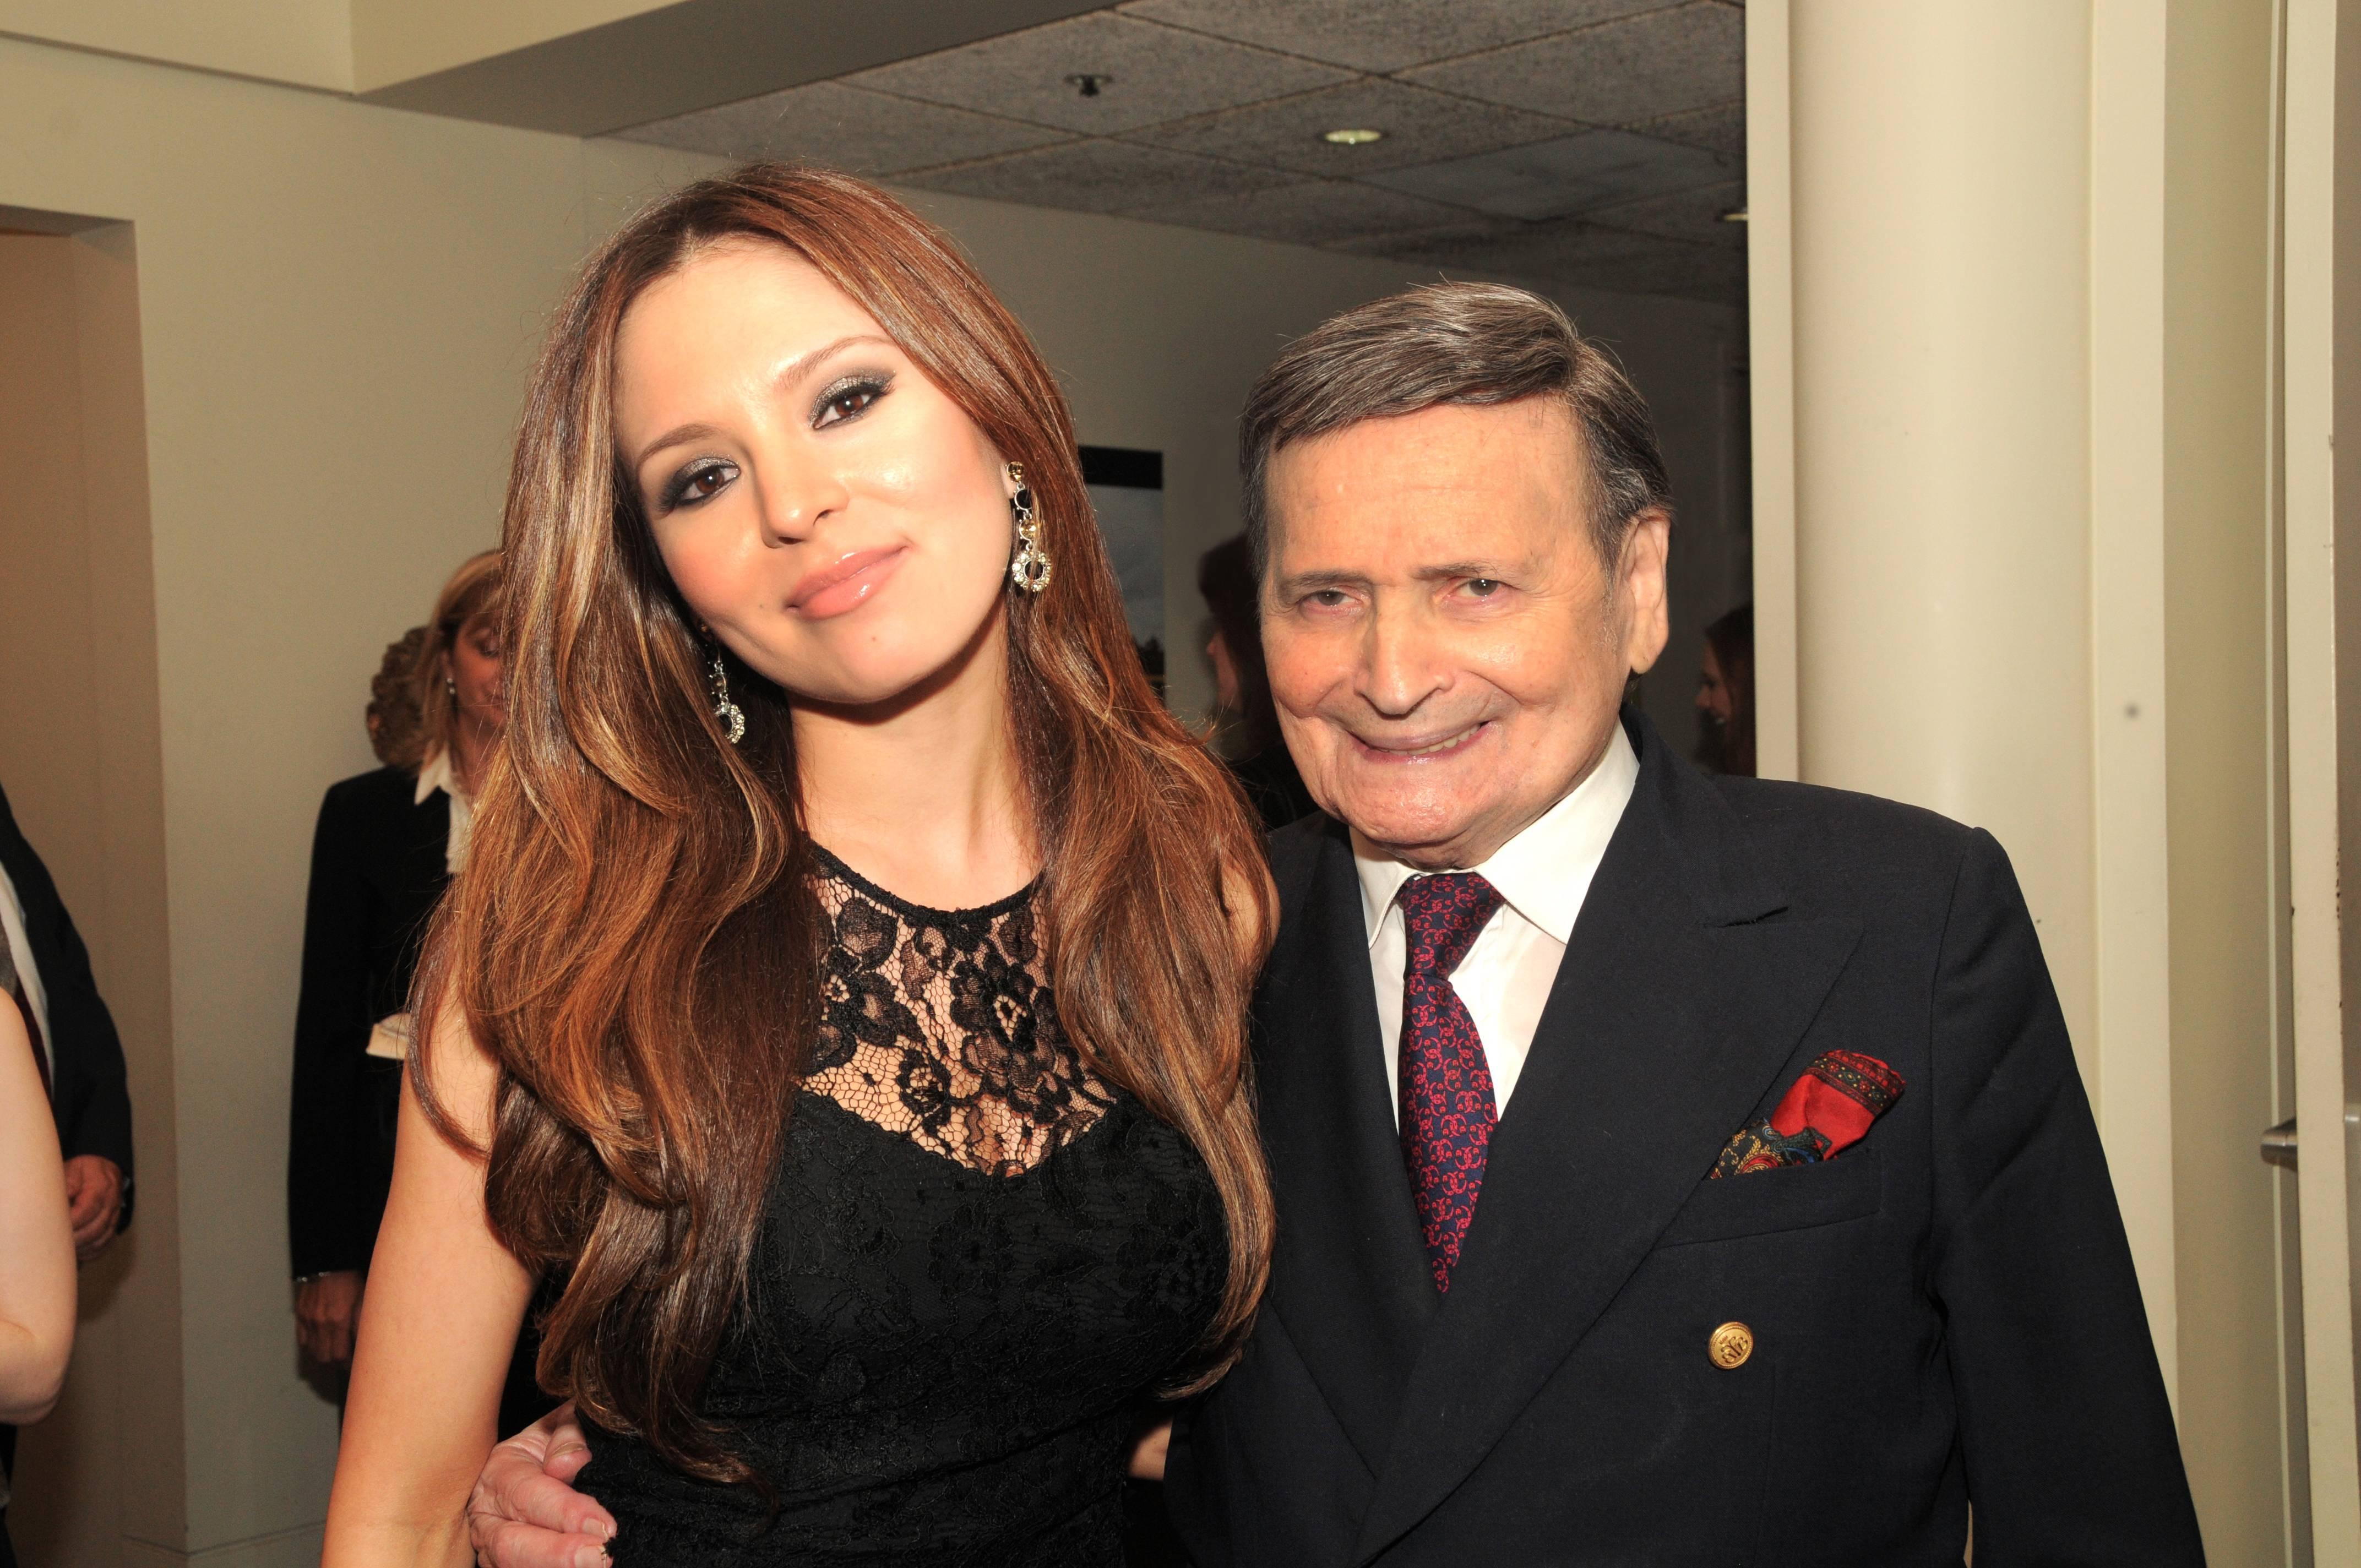 Byron Janis and Lola Astanova